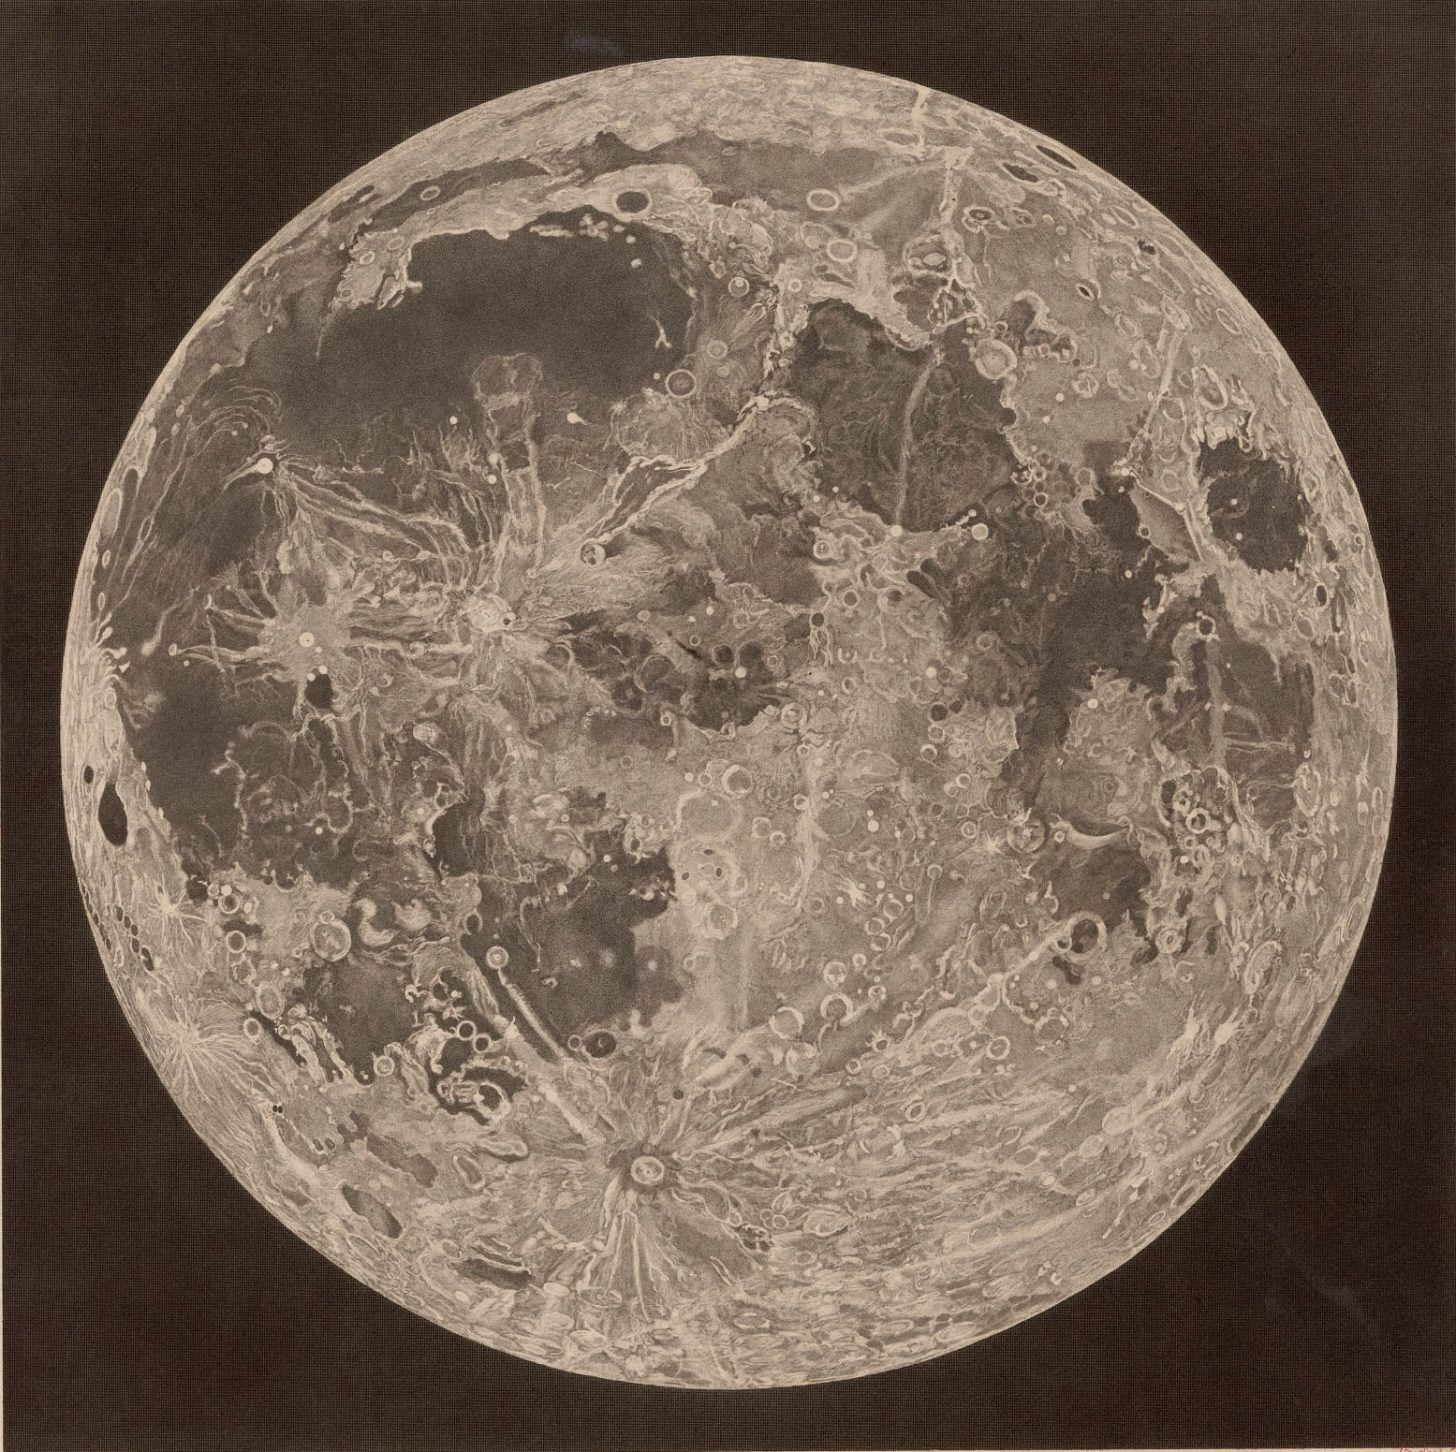 которыми карта луны с фото и названиями через три